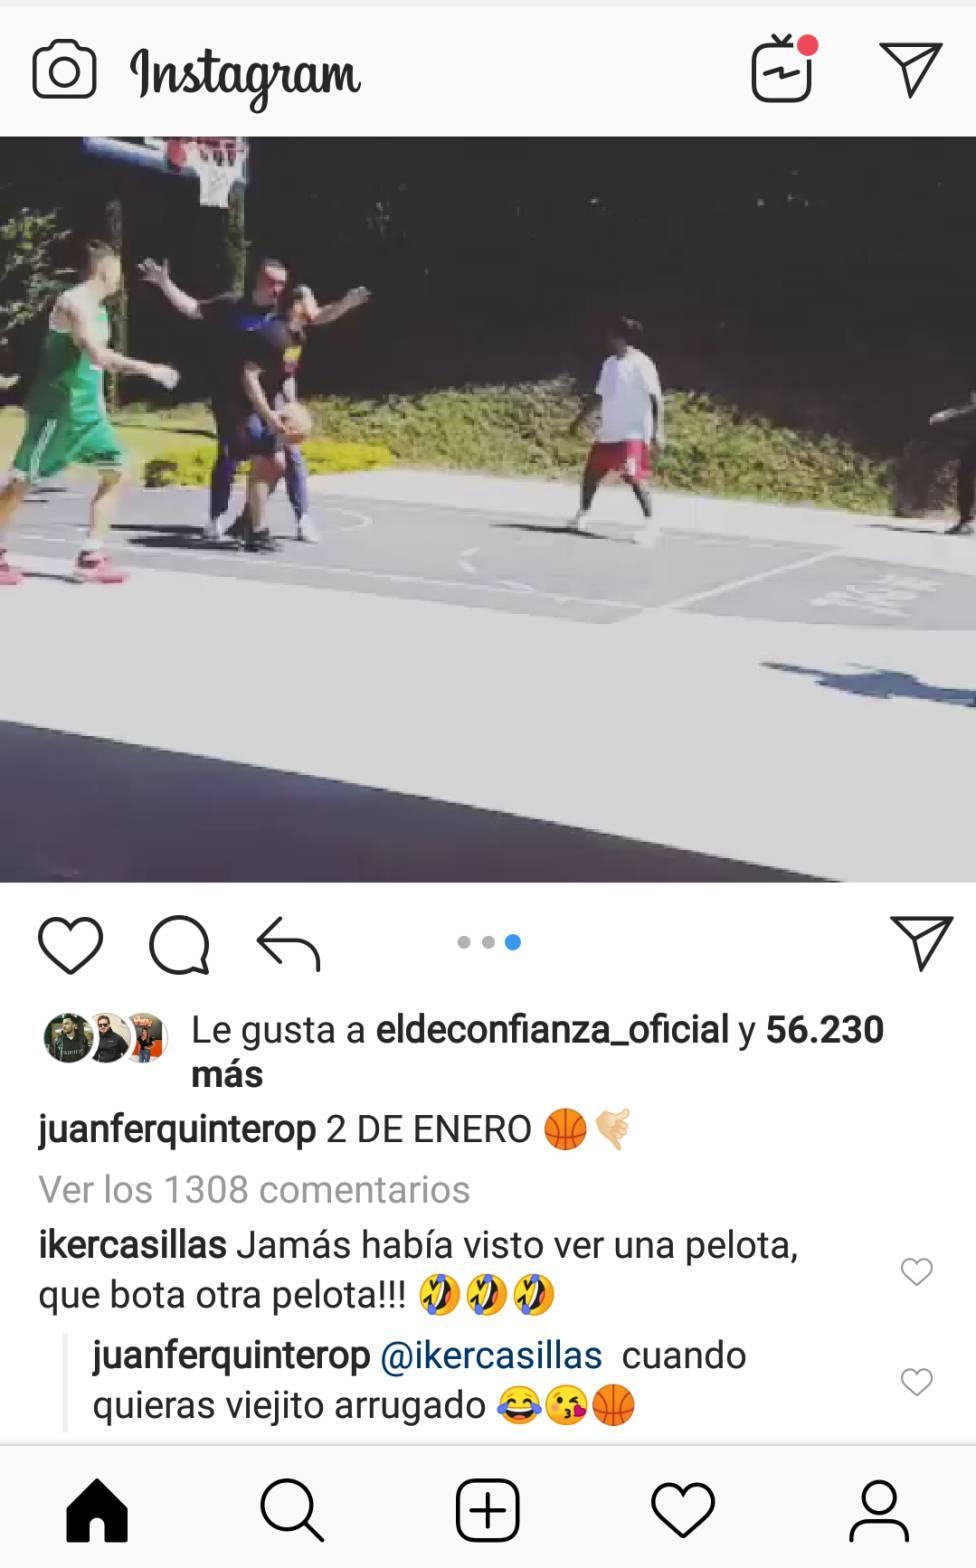 Juan Fernando Quintero e Iker Casillas | Broma en Instagram